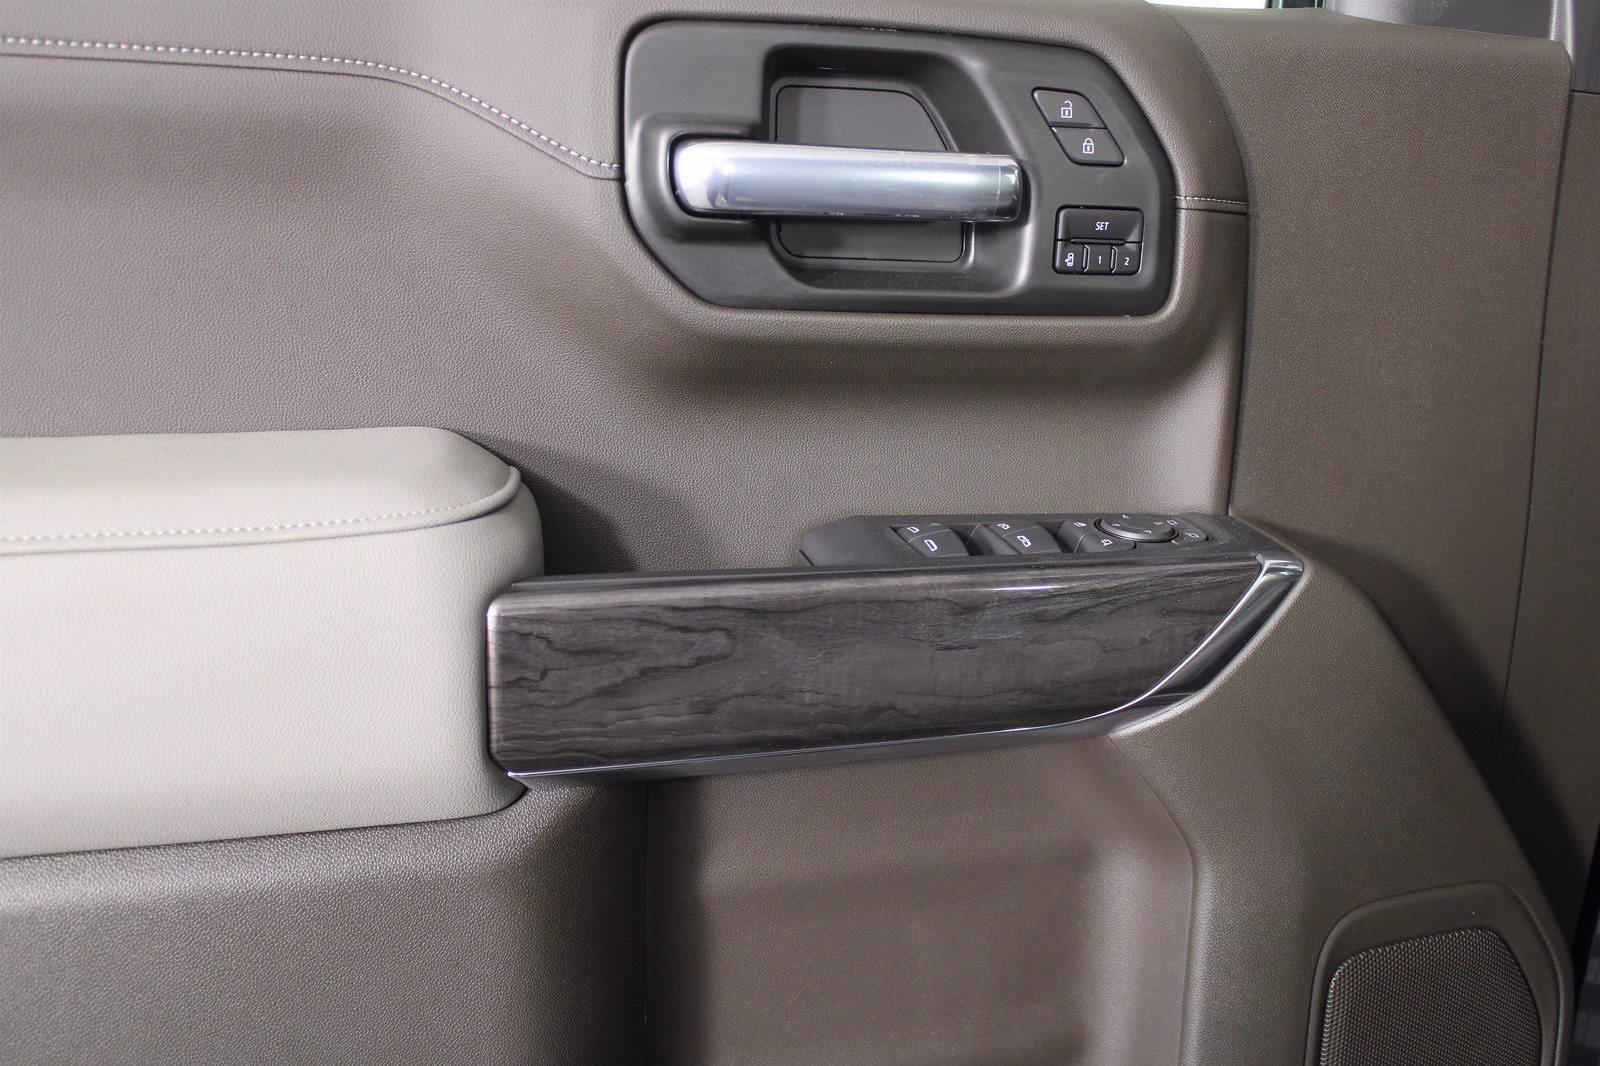 2021 Chevrolet Silverado 1500 Crew Cab 4x4, Pickup #D111155 - photo 11